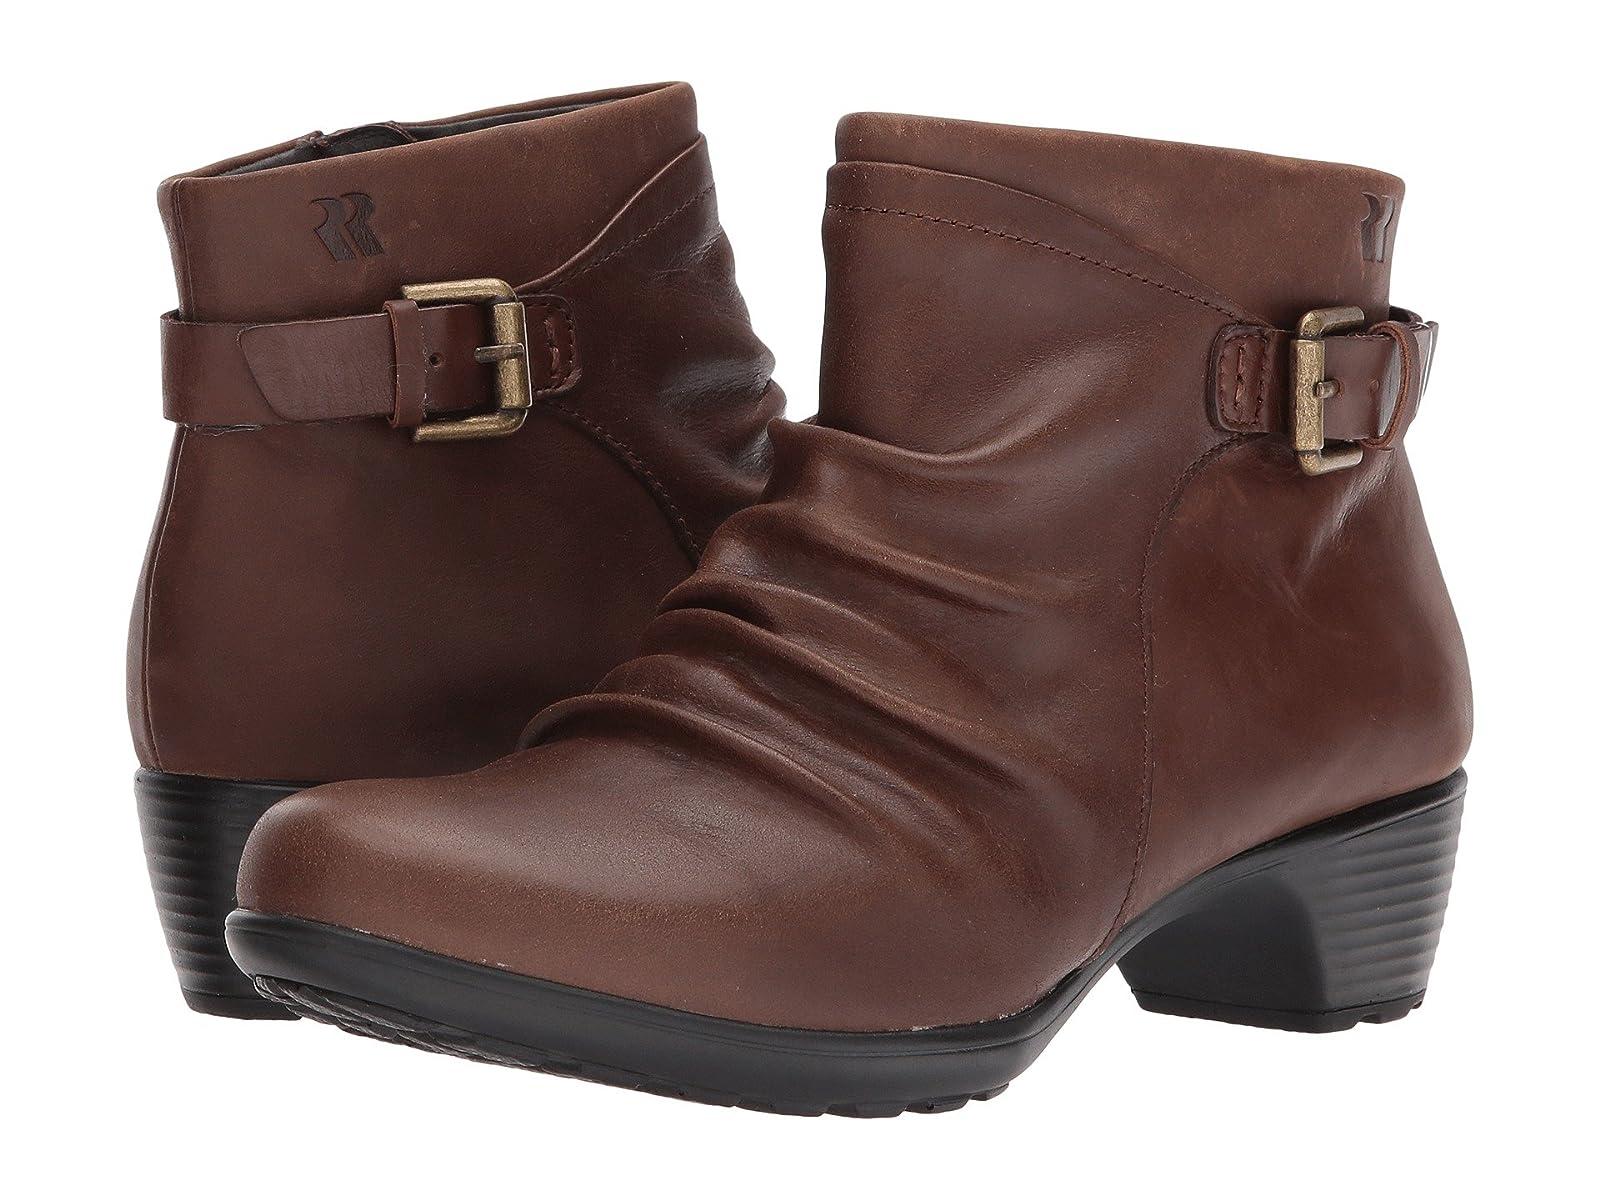 Romika Banja 14Cheap and distinctive eye-catching shoes